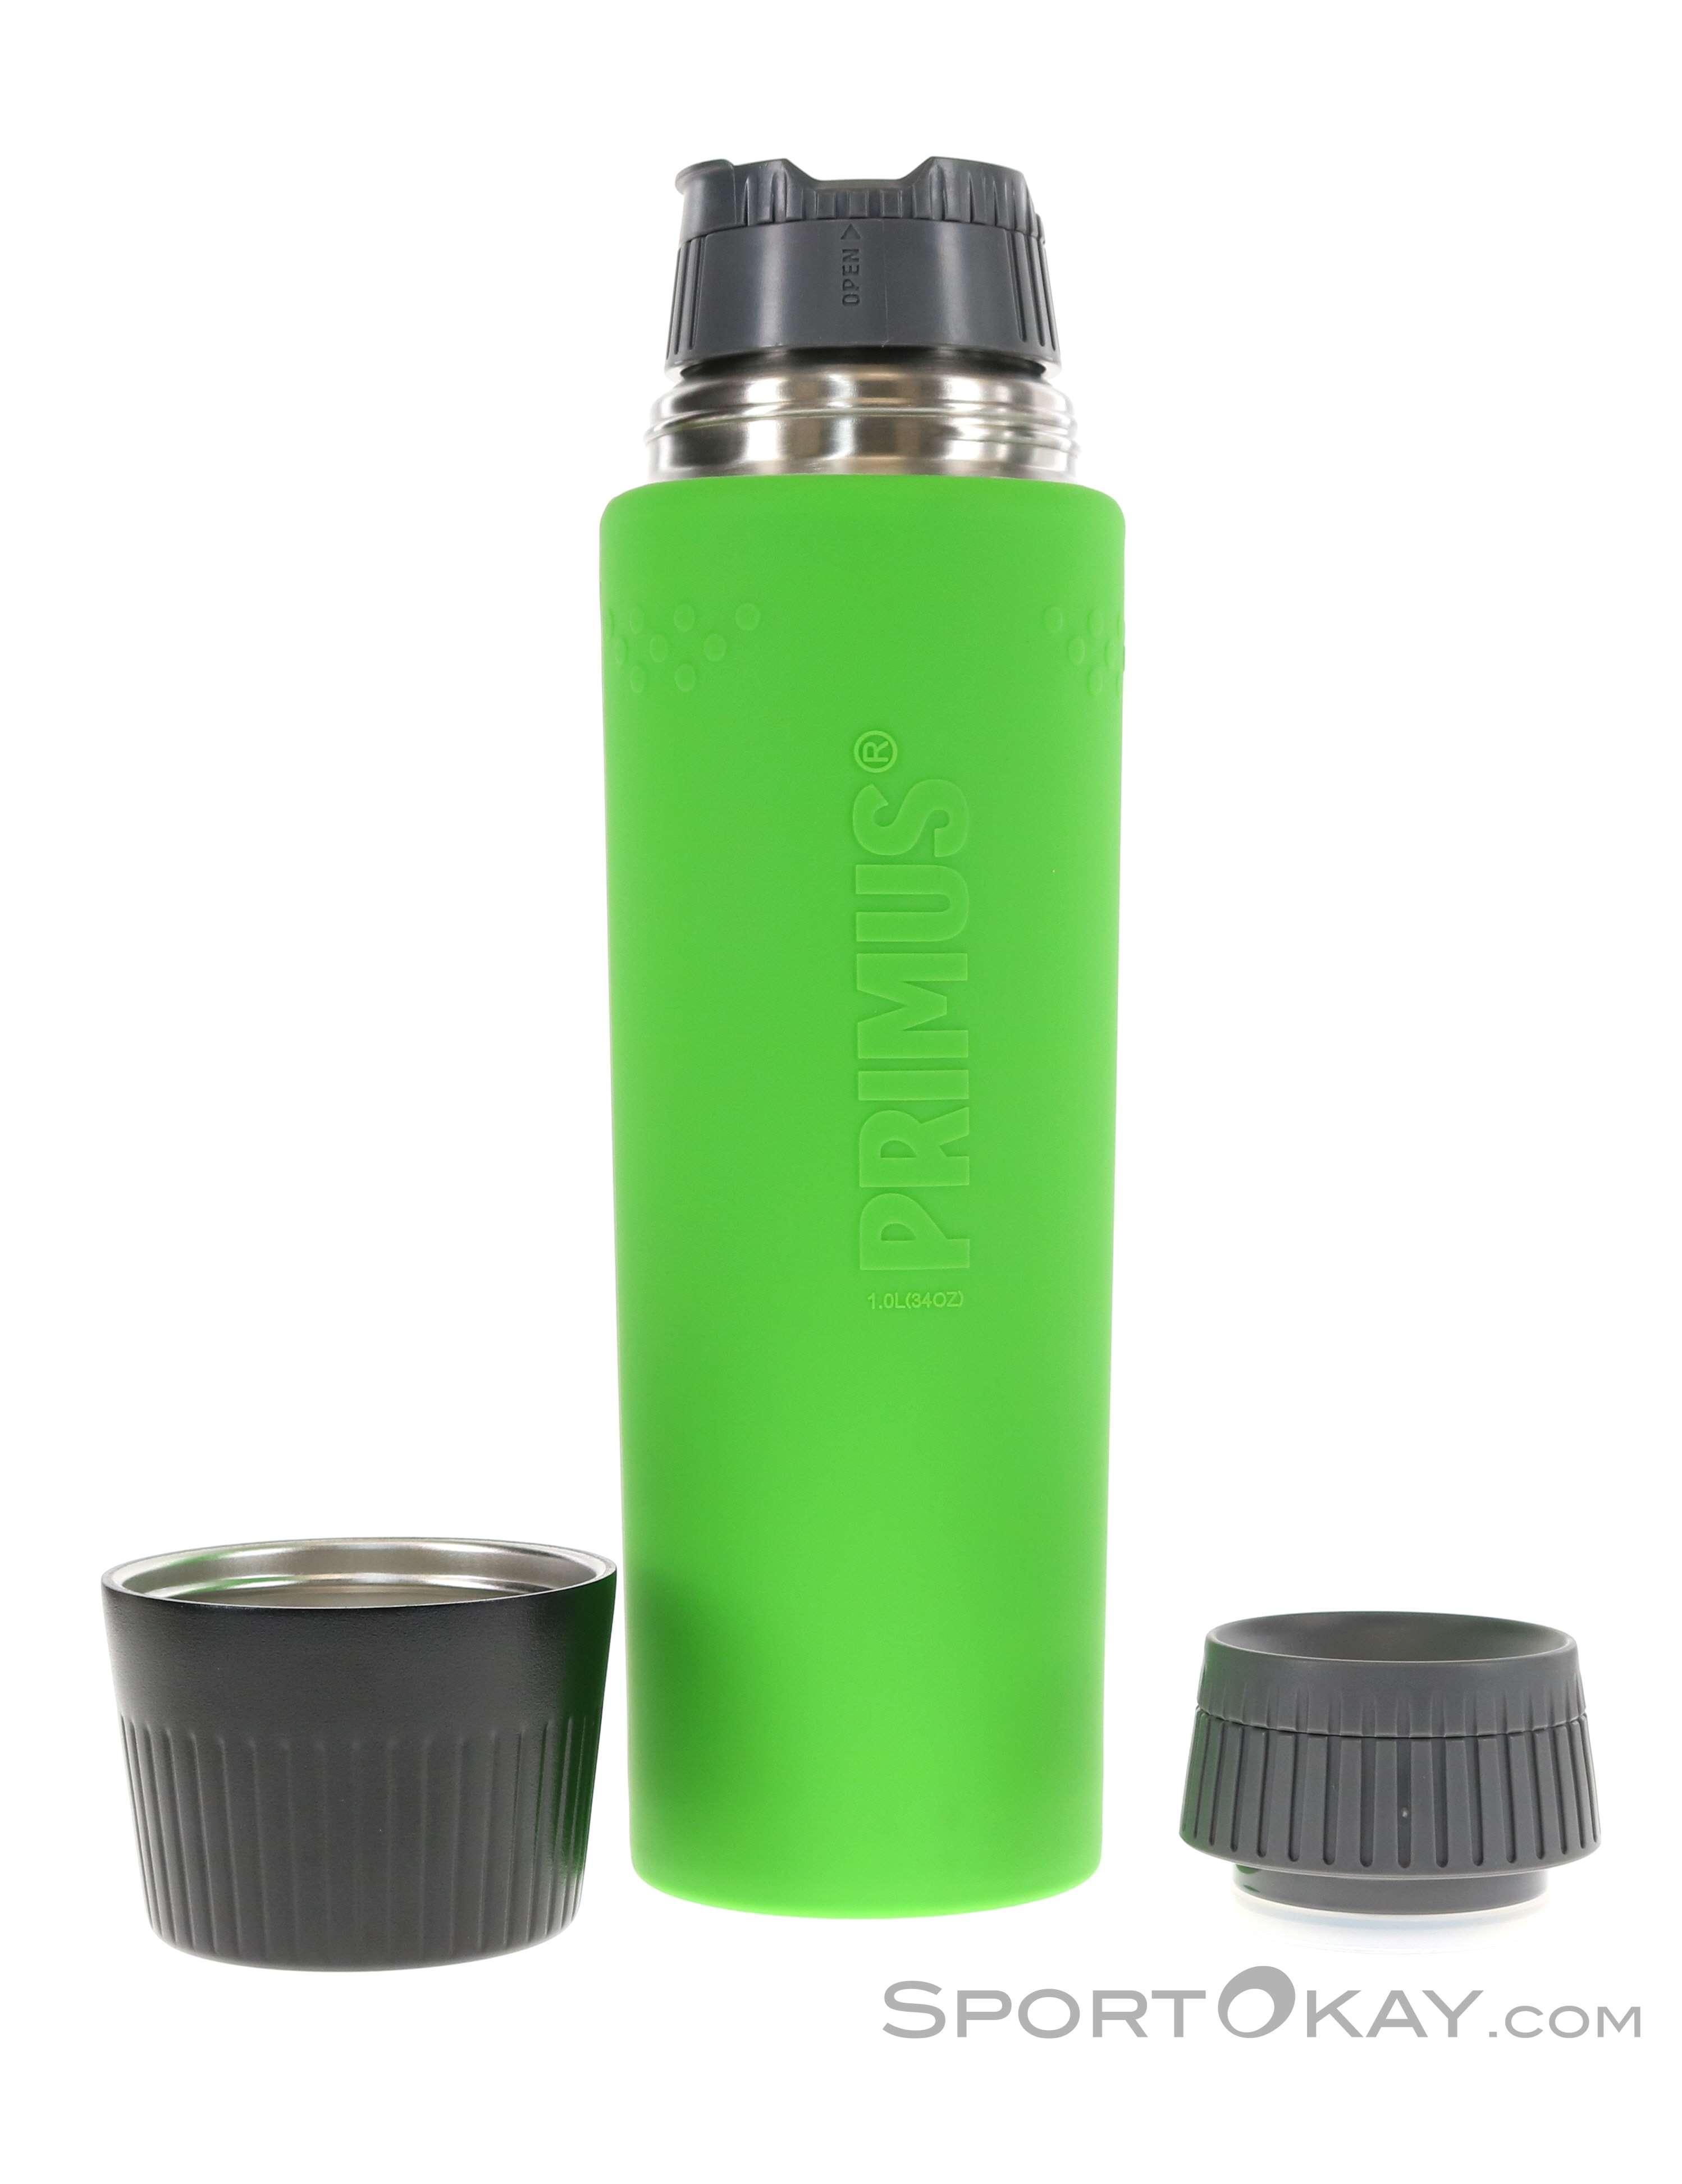 Primus Thermoflasche Trail break EX Vacuum jug Drinking bottle 1l